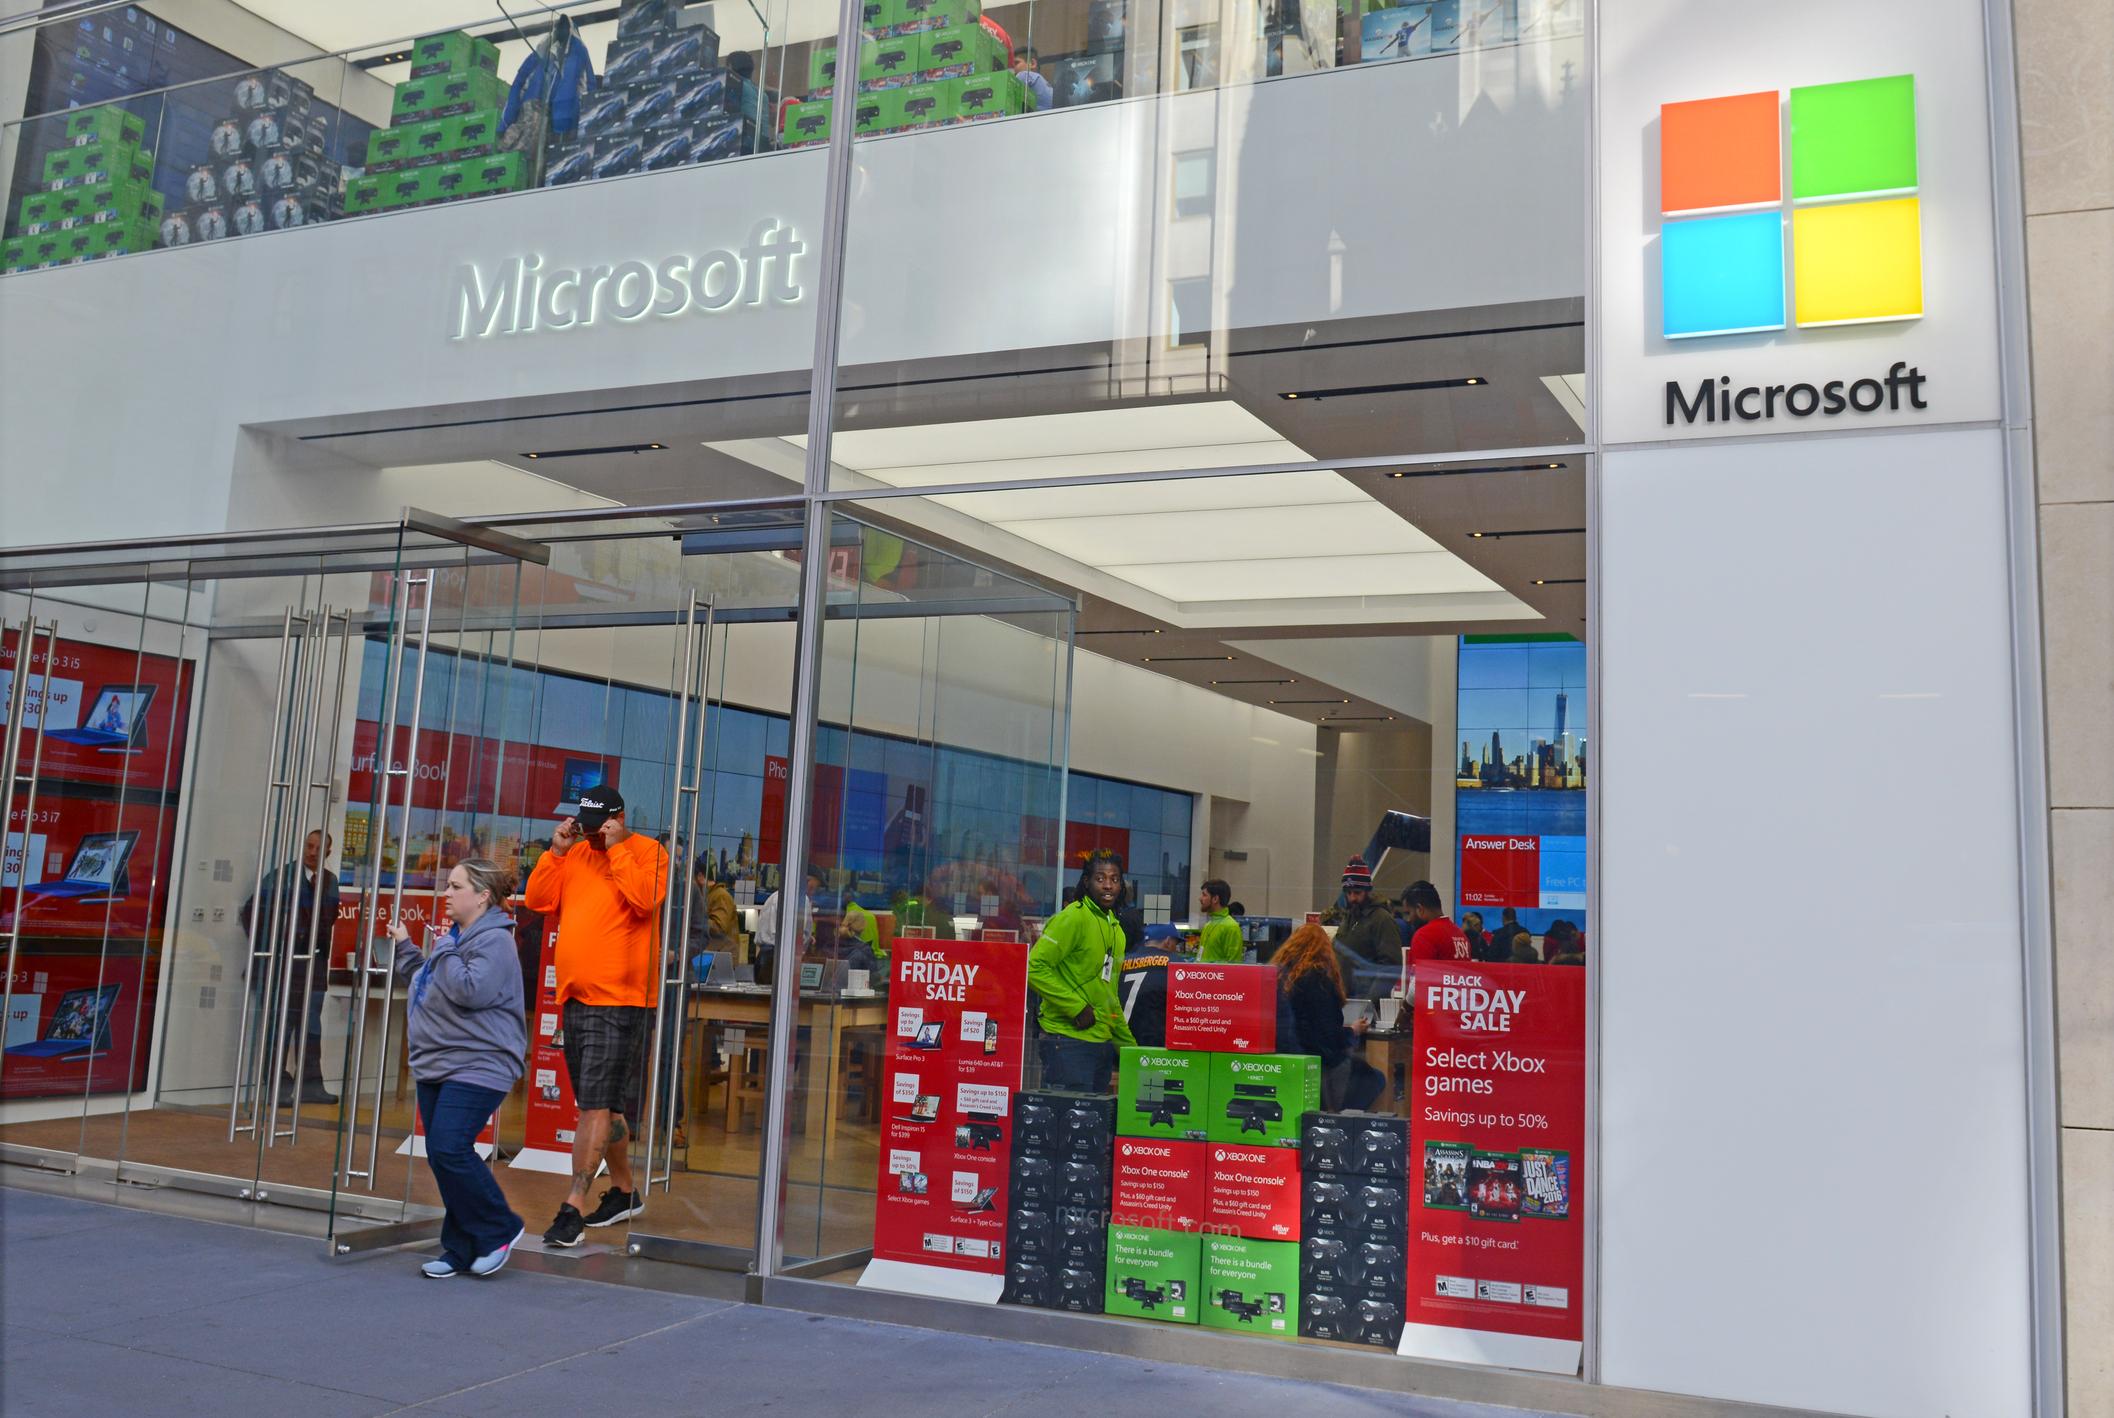 A Microsoft storefront.